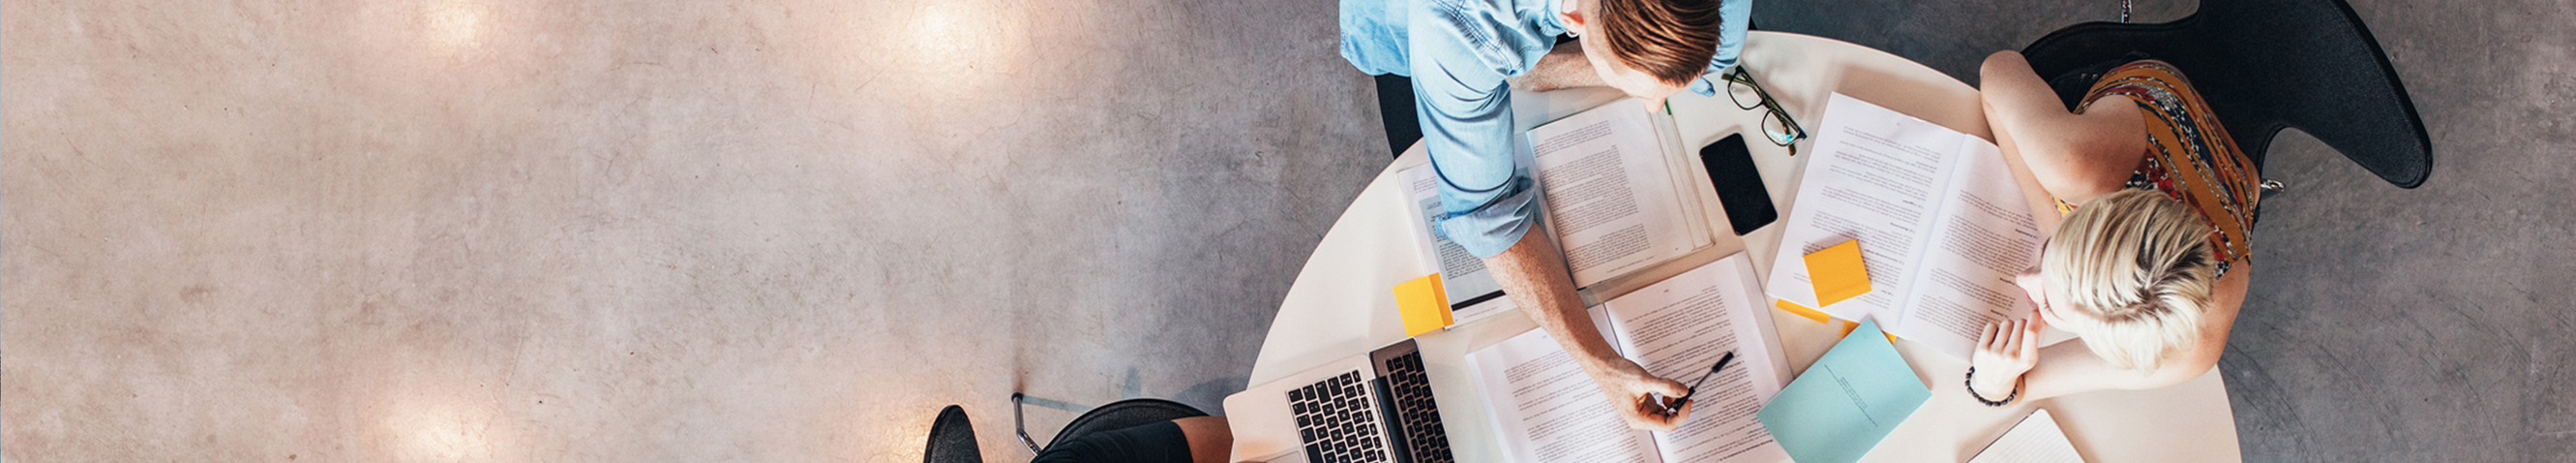 dissertation topics in business leadership